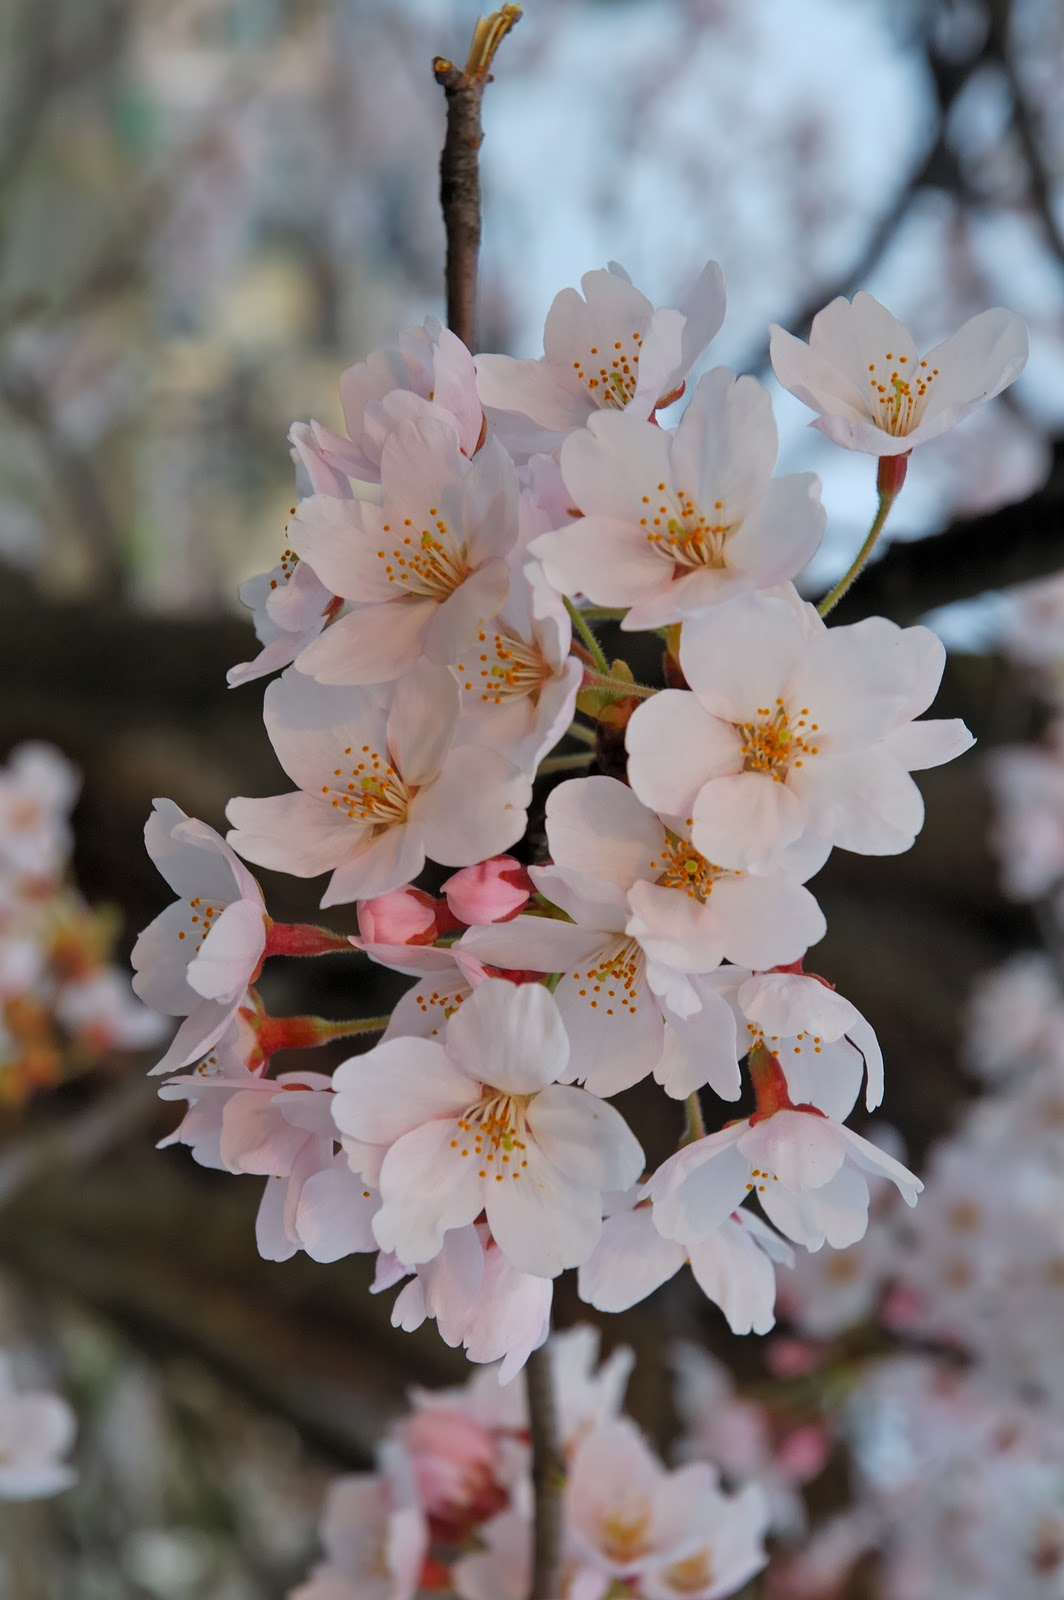 Sakura Flowers: Japanese Cherry Blossoms